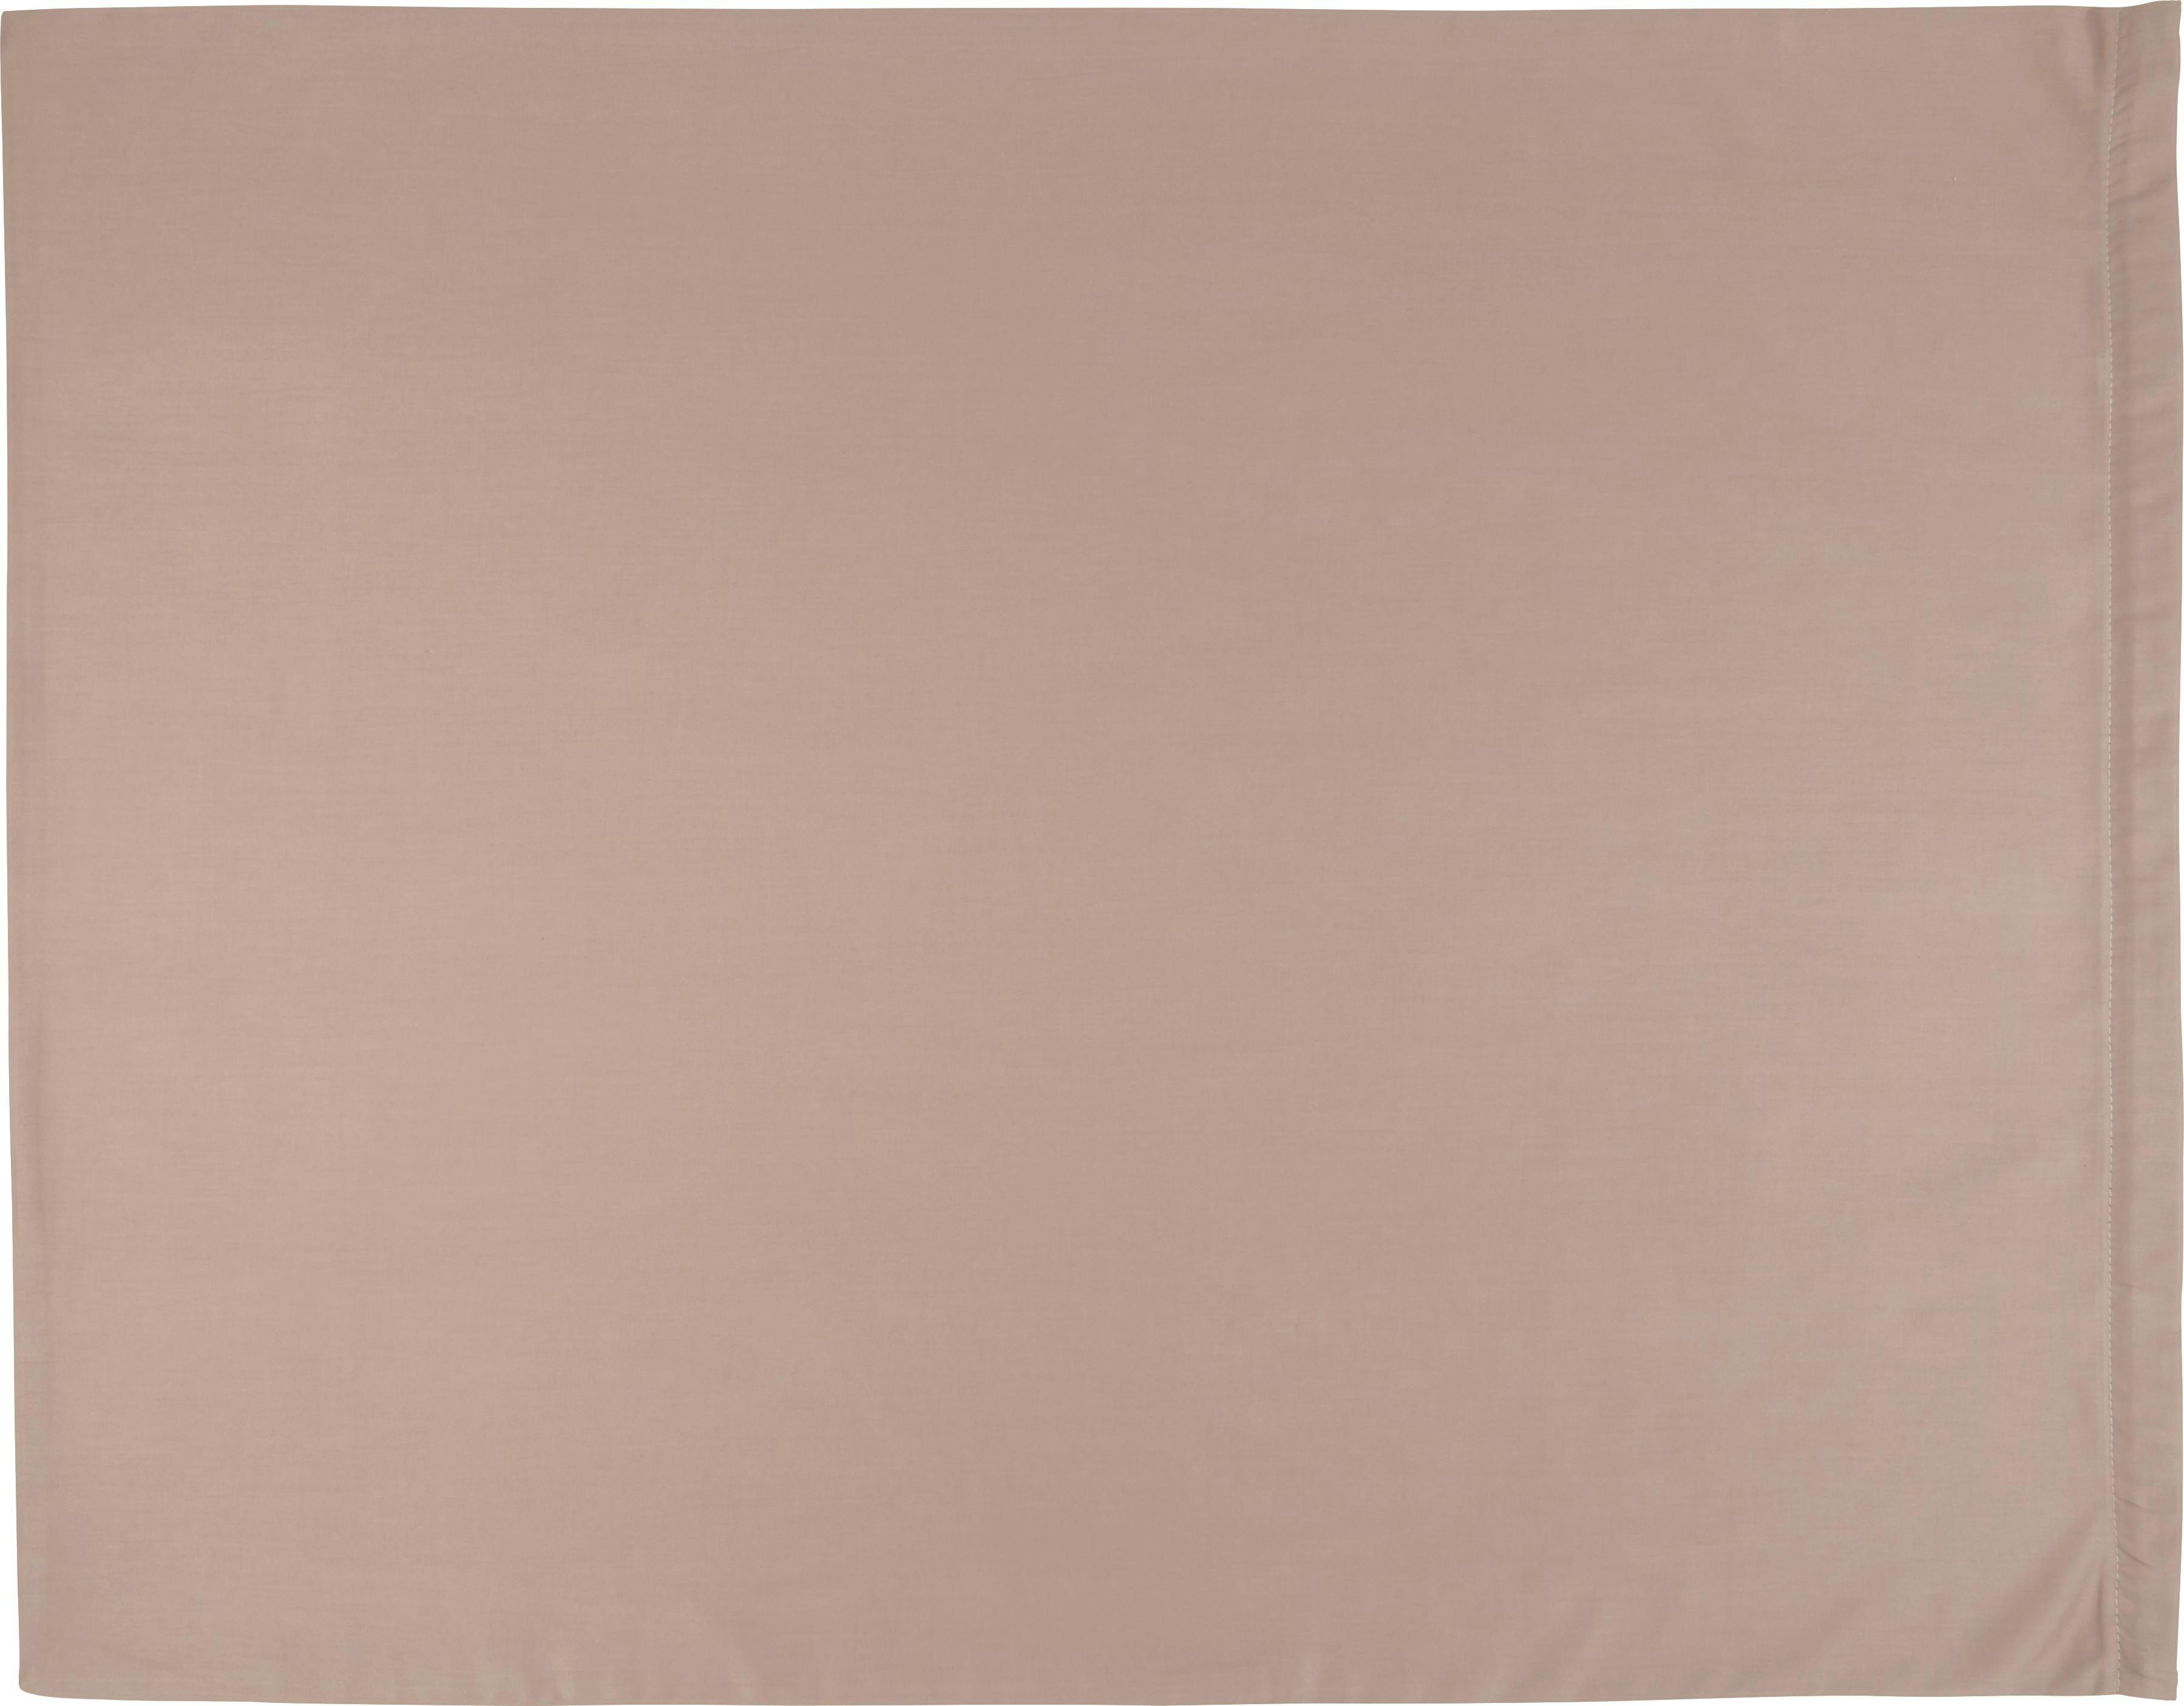 "Povlak Na Polštář ""belinda"" - šedá/krémová, textil (70/90cm) - PREMIUM LIVING"